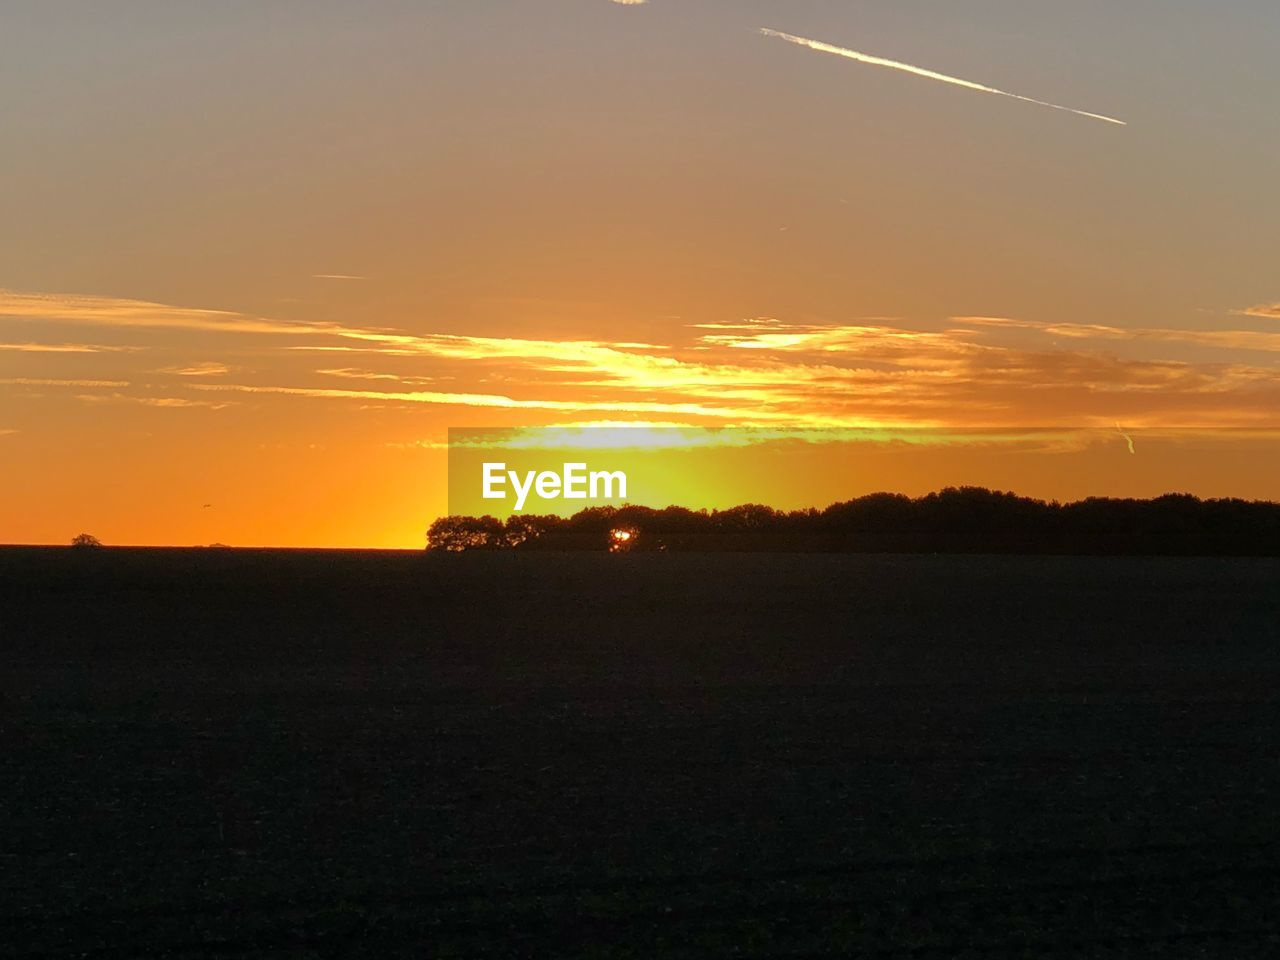 sunset, sky, beauty in nature, scenics - nature, tranquil scene, landscape, tranquility, orange color, environment, field, land, nature, idyllic, no people, non-urban scene, silhouette, plant, sun, cloud - sky, rural scene, outdoors, vapor trail